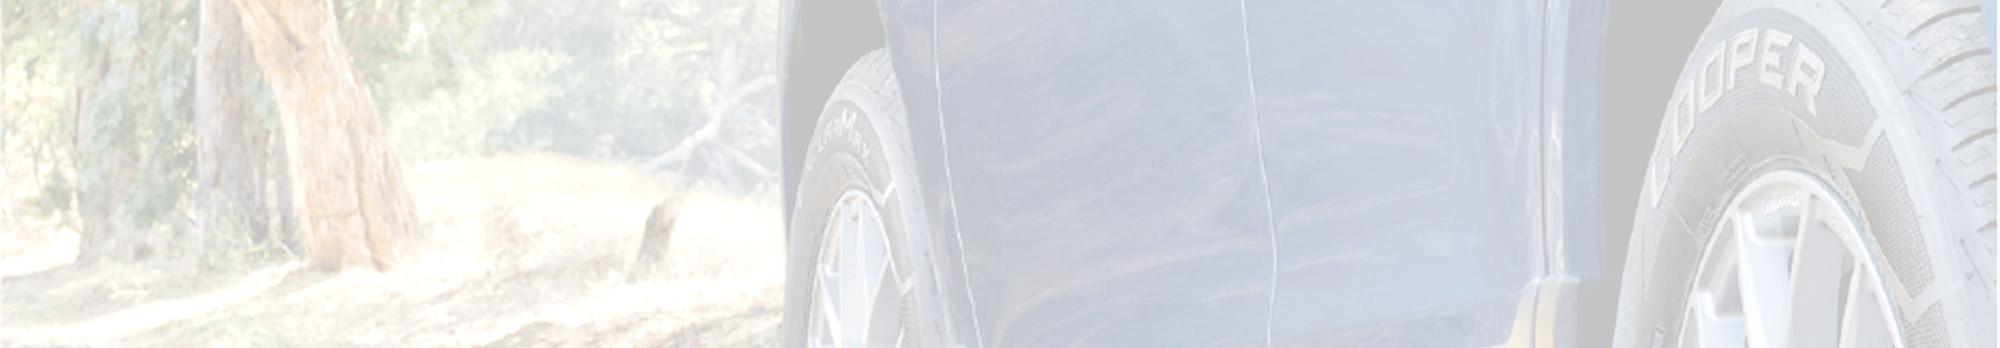 Cooper Tires banner background